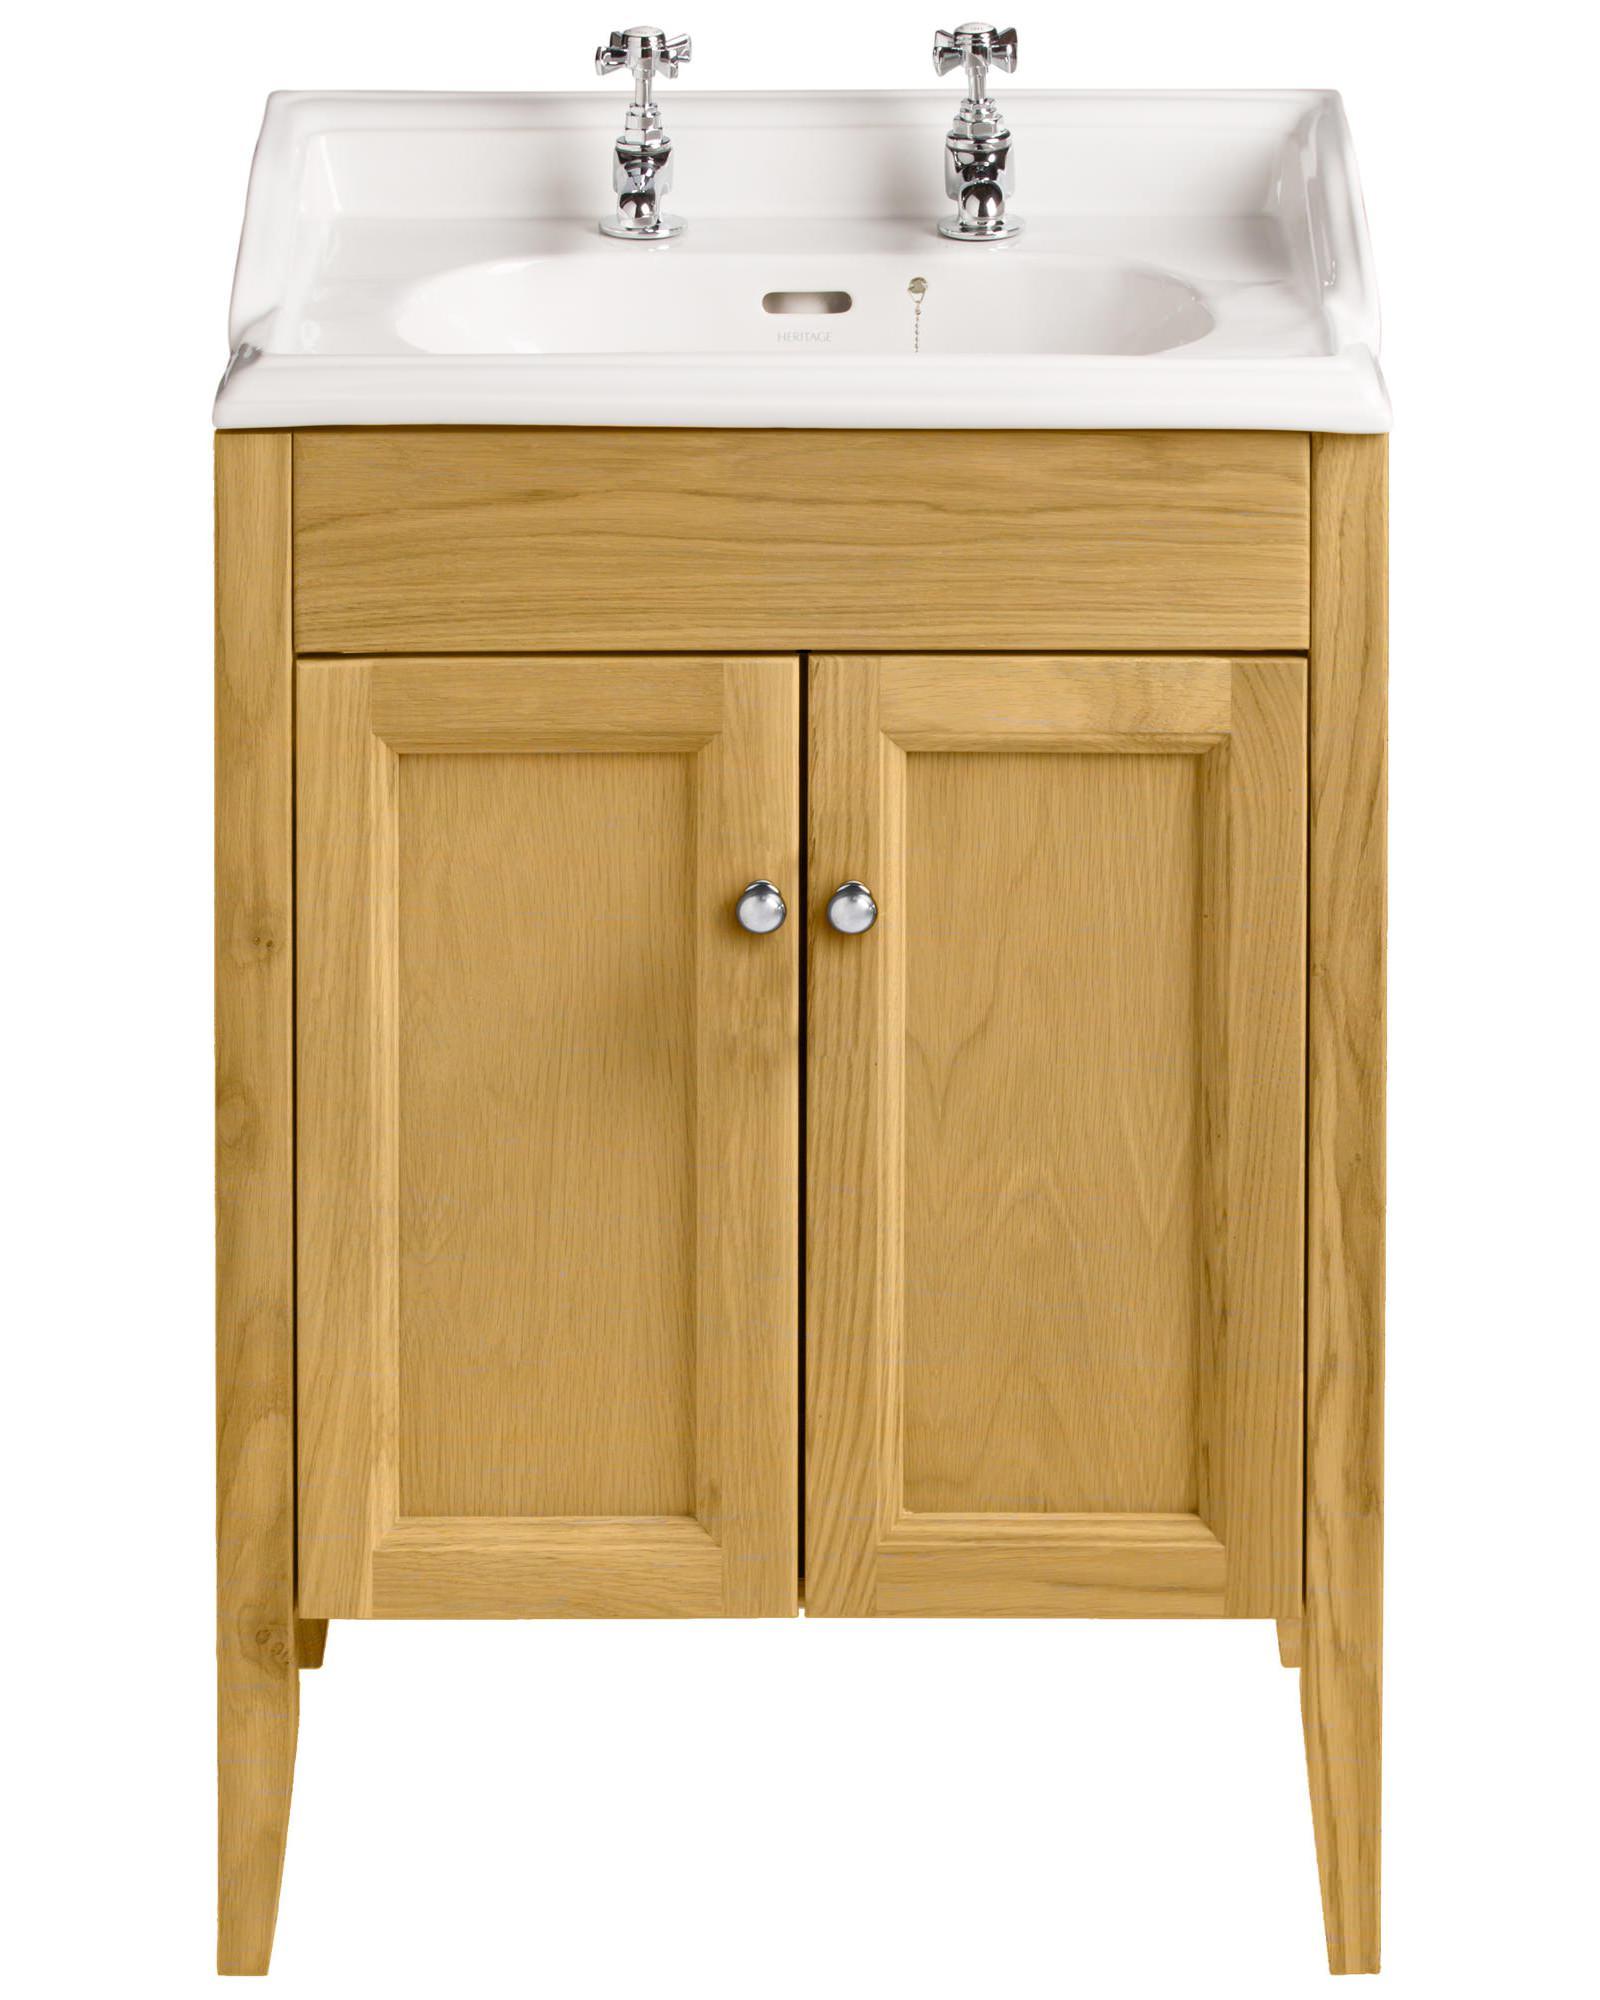 Heritage Bathroom Vanity: Heritage Caversham Oak Vanity Unit For Dorchester Square